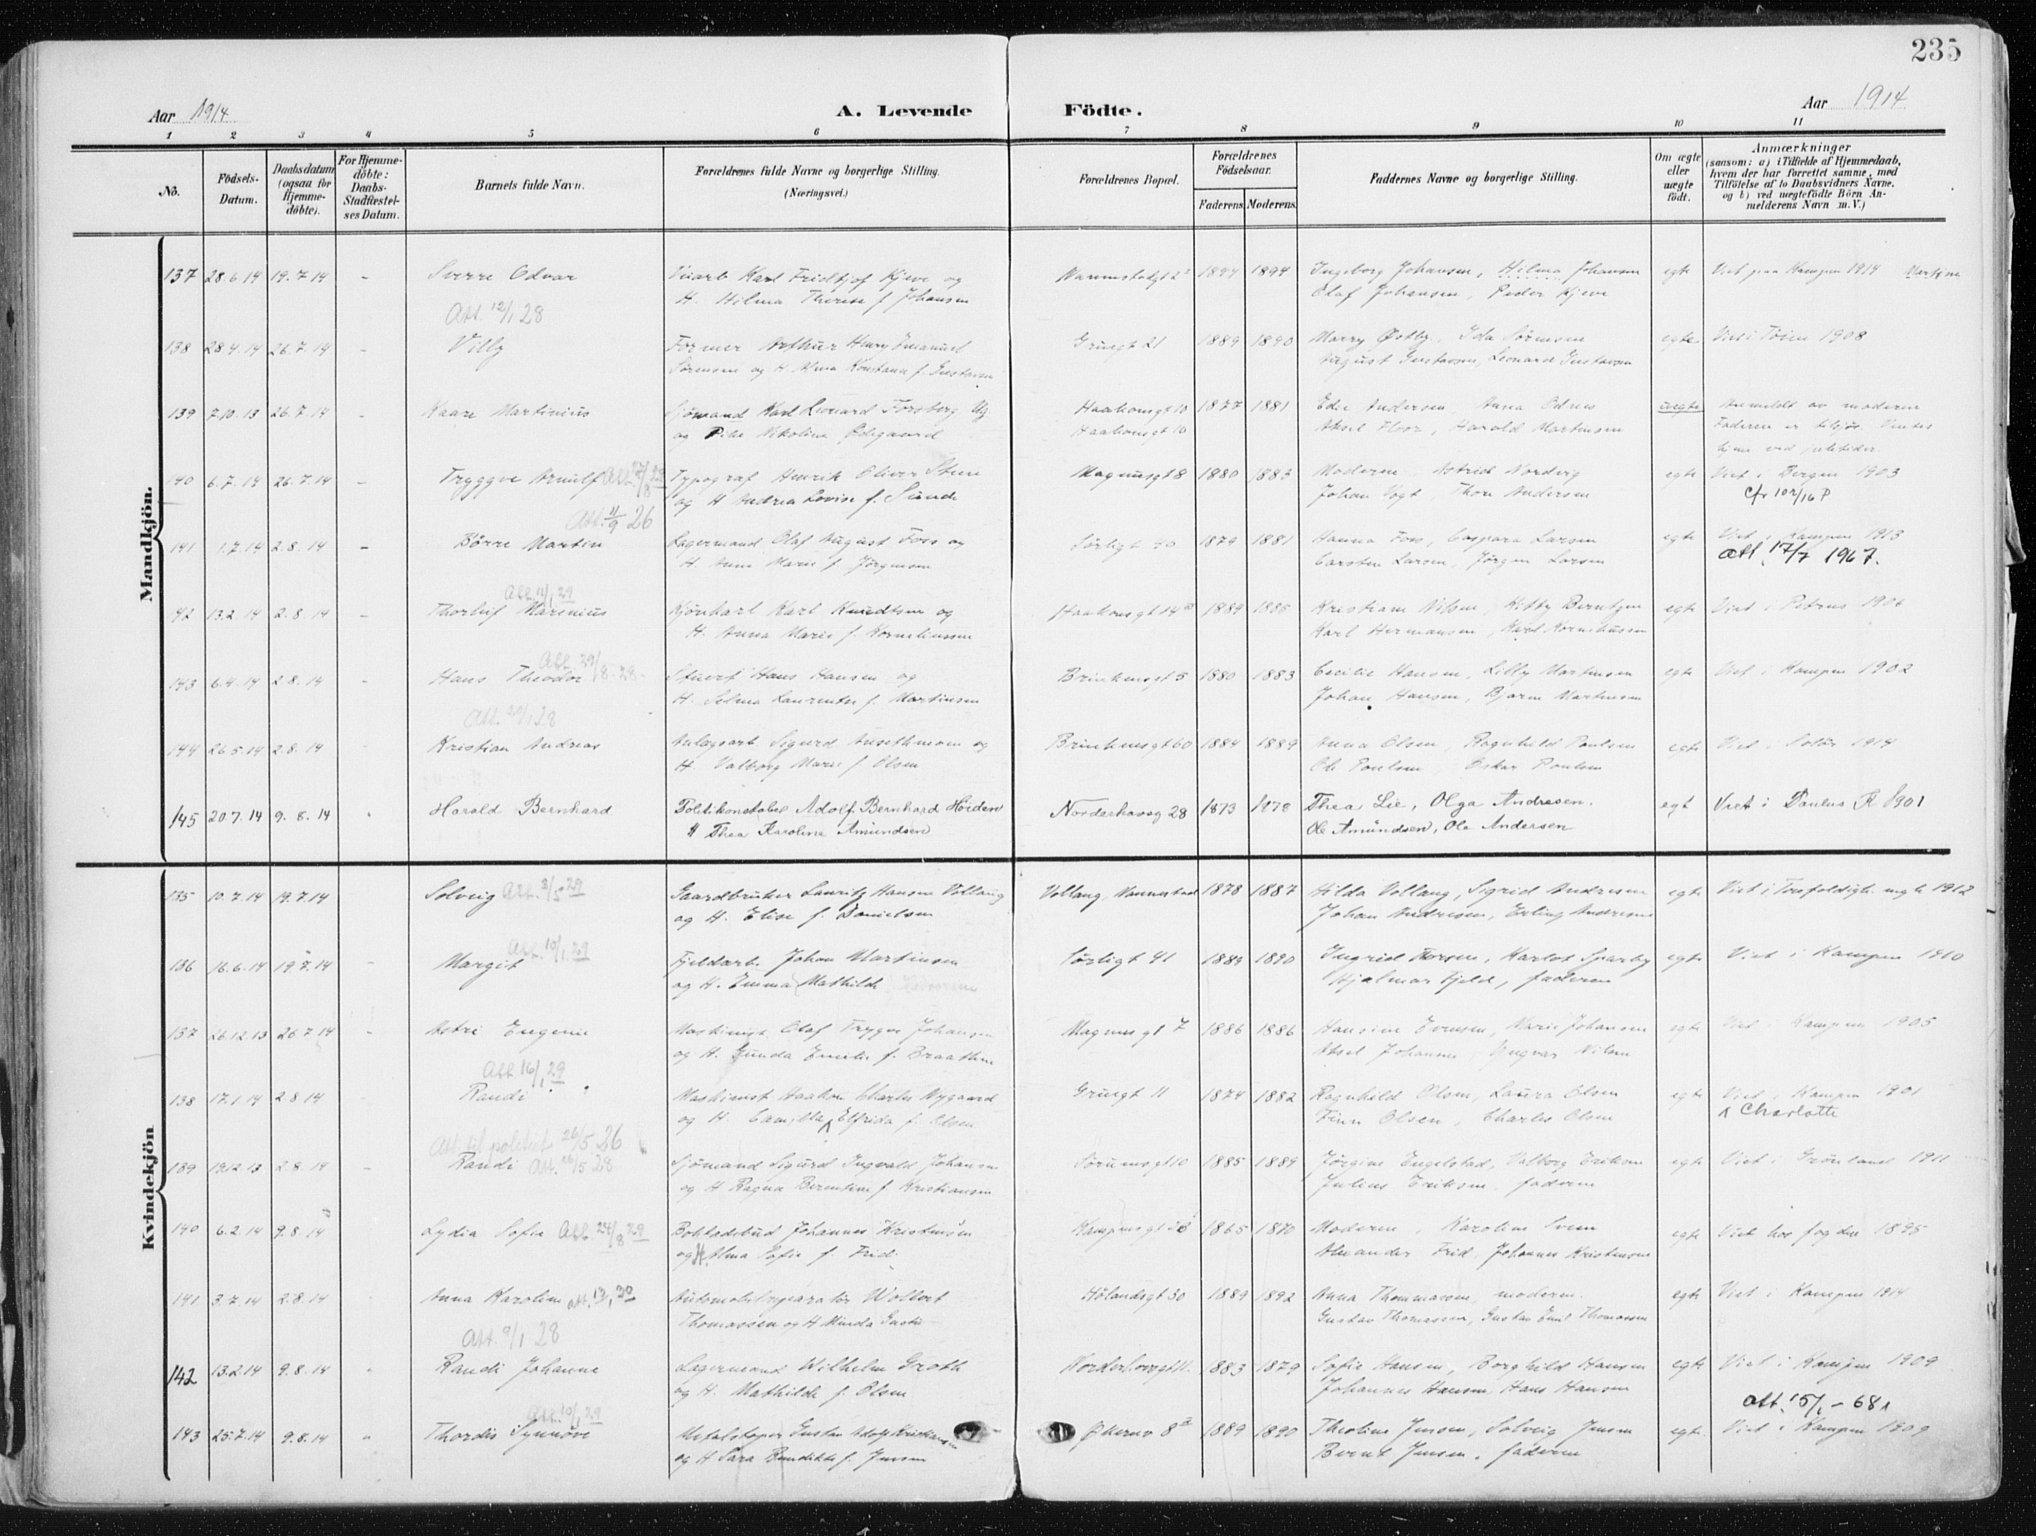 SAO, Kampen prestekontor Kirkebøker, F/Fa/L0010: Ministerialbok nr. I 10, 1905-1917, s. 235